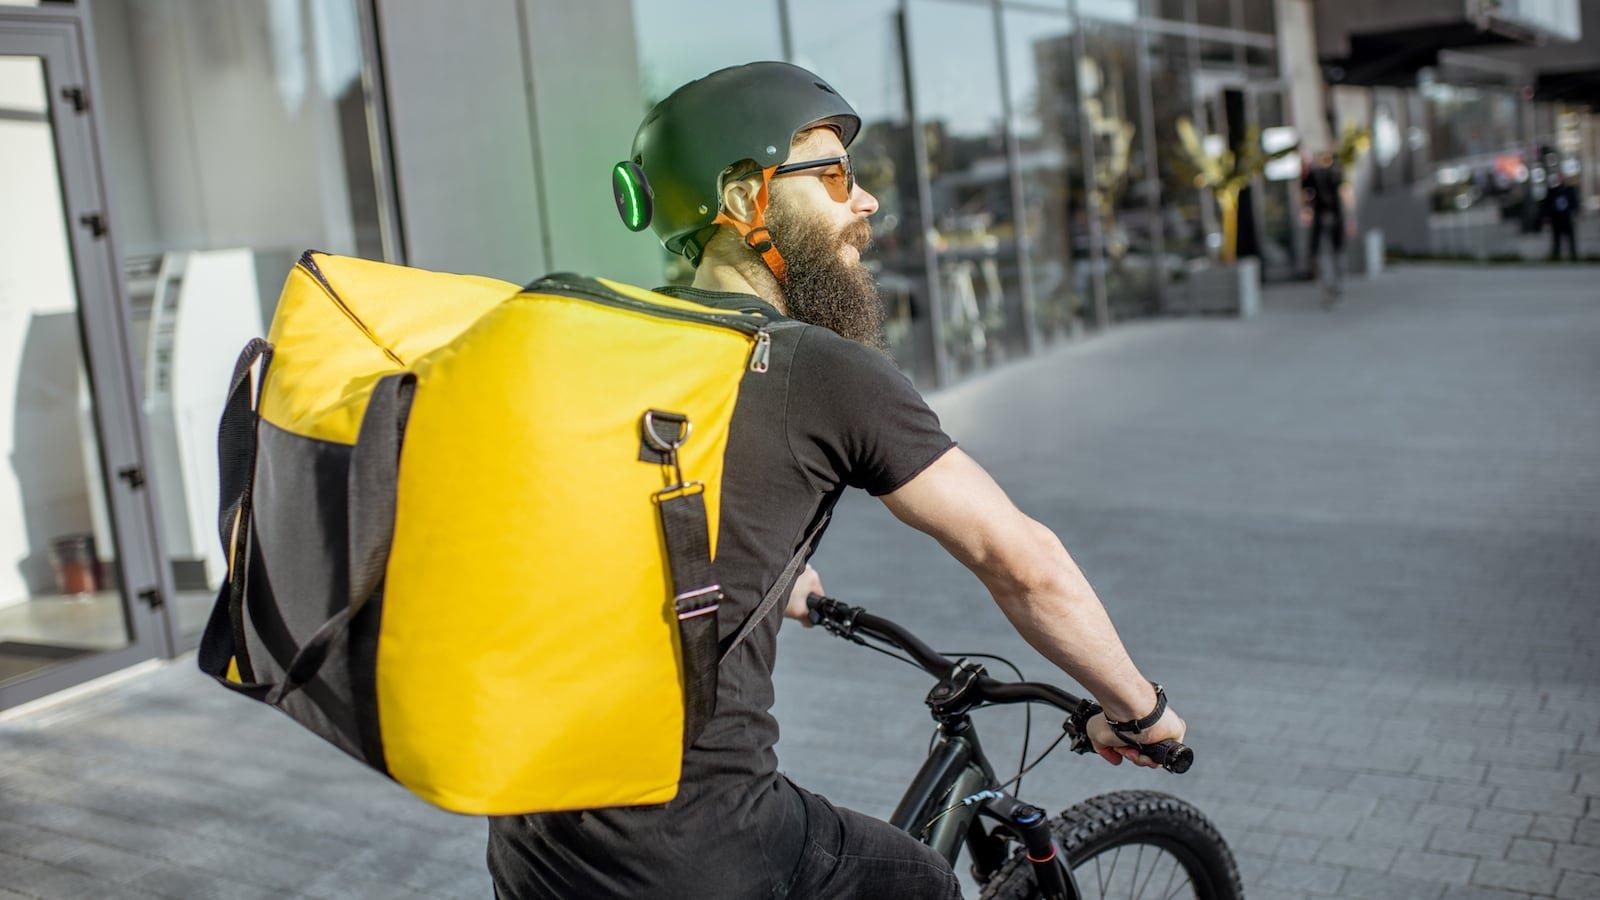 Ticc* smart blinker lets urban commuters ride safer